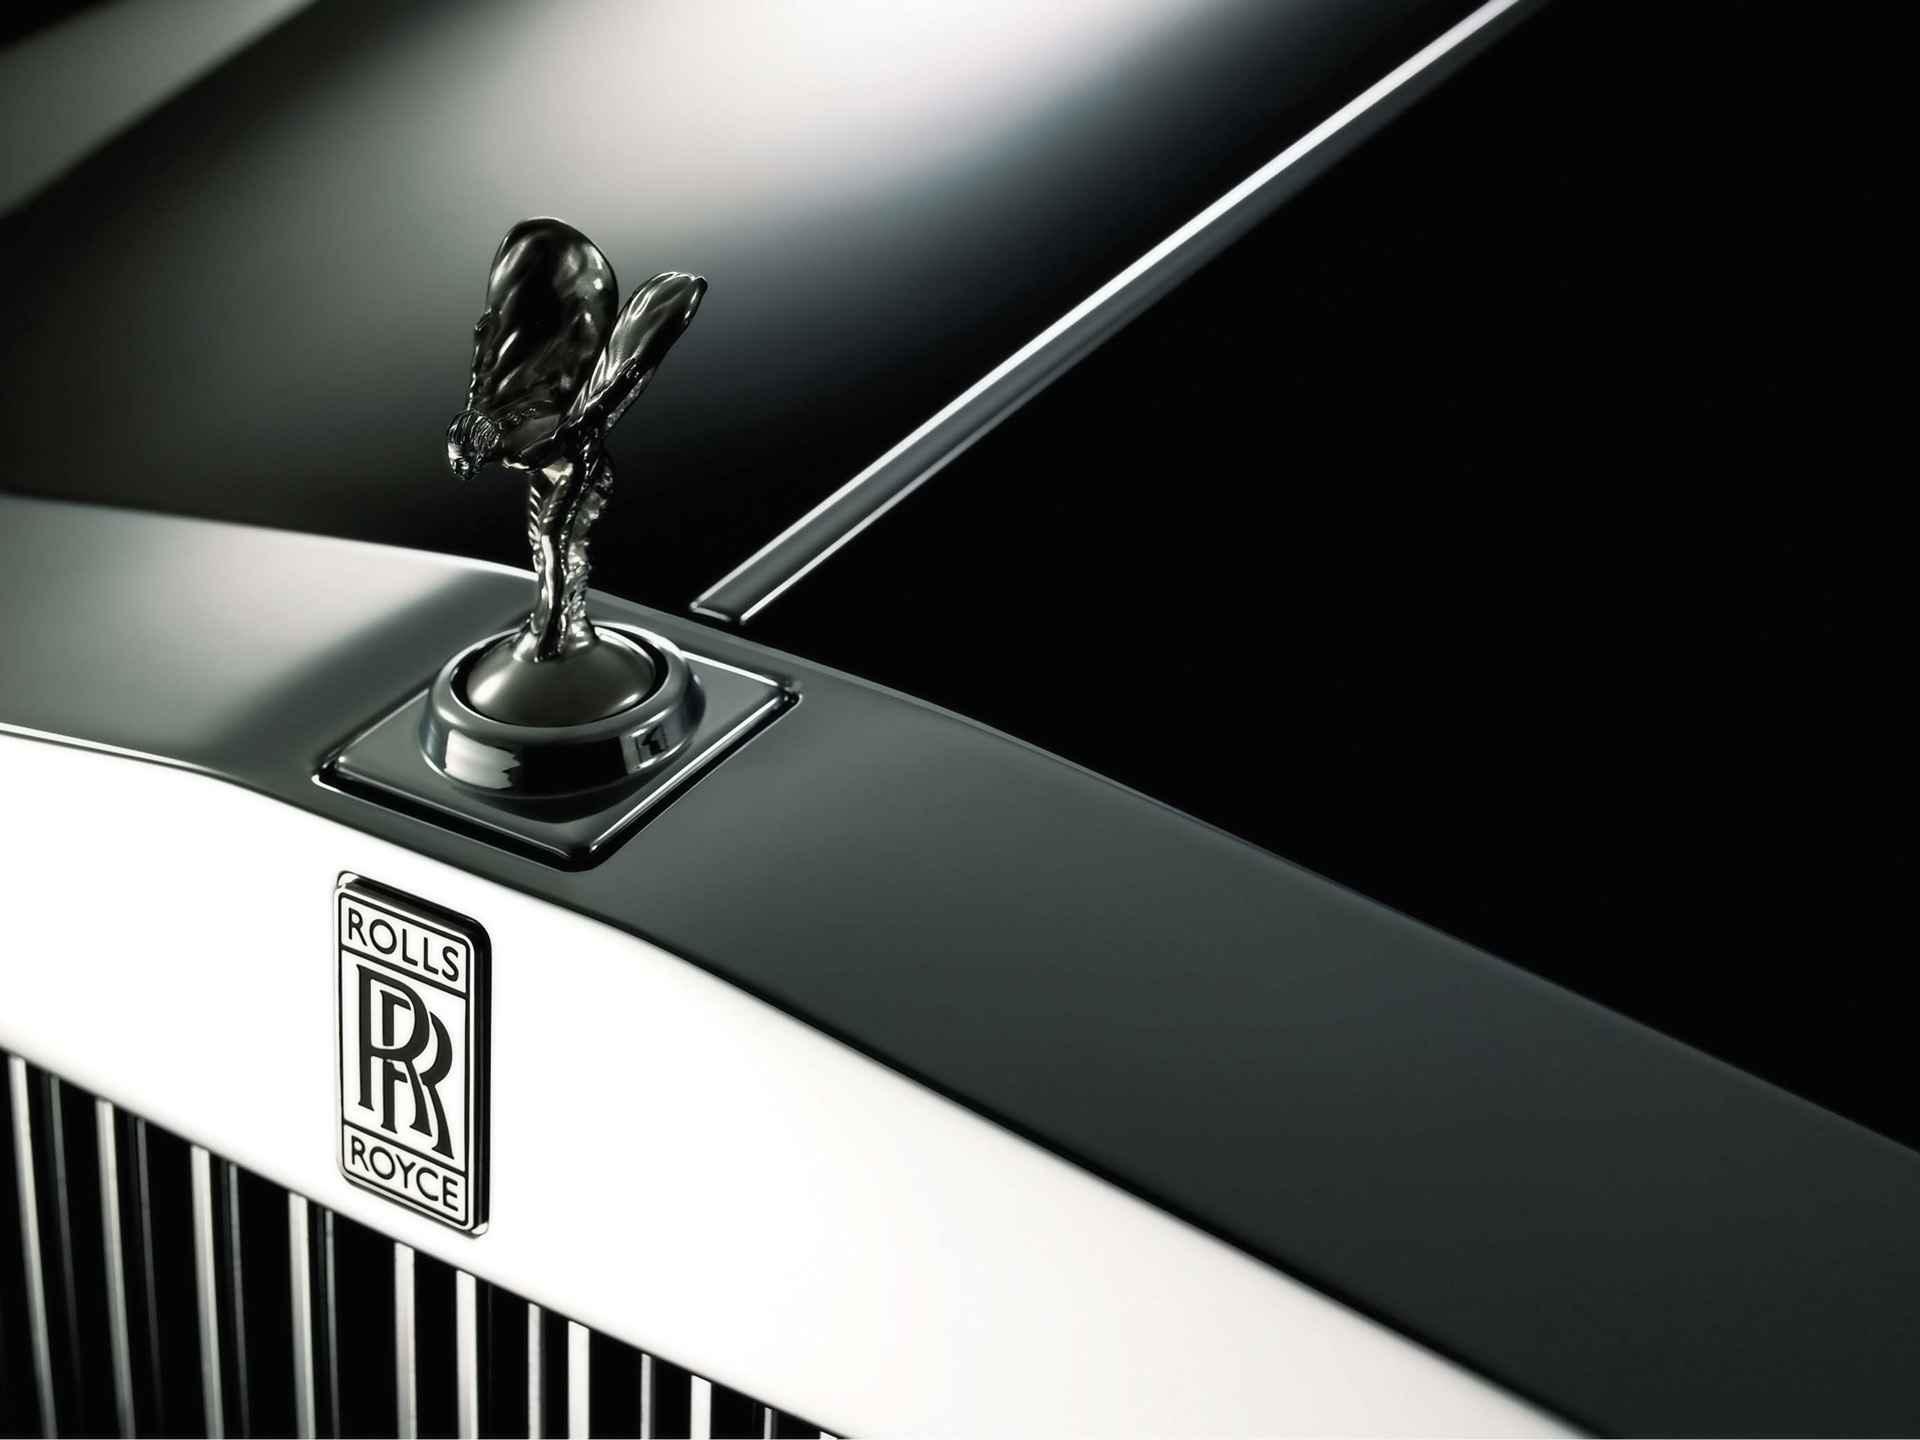 2009 Rolls Royce Phantom Hood Ornament Spirit of Ecstasy 3 1920x1440